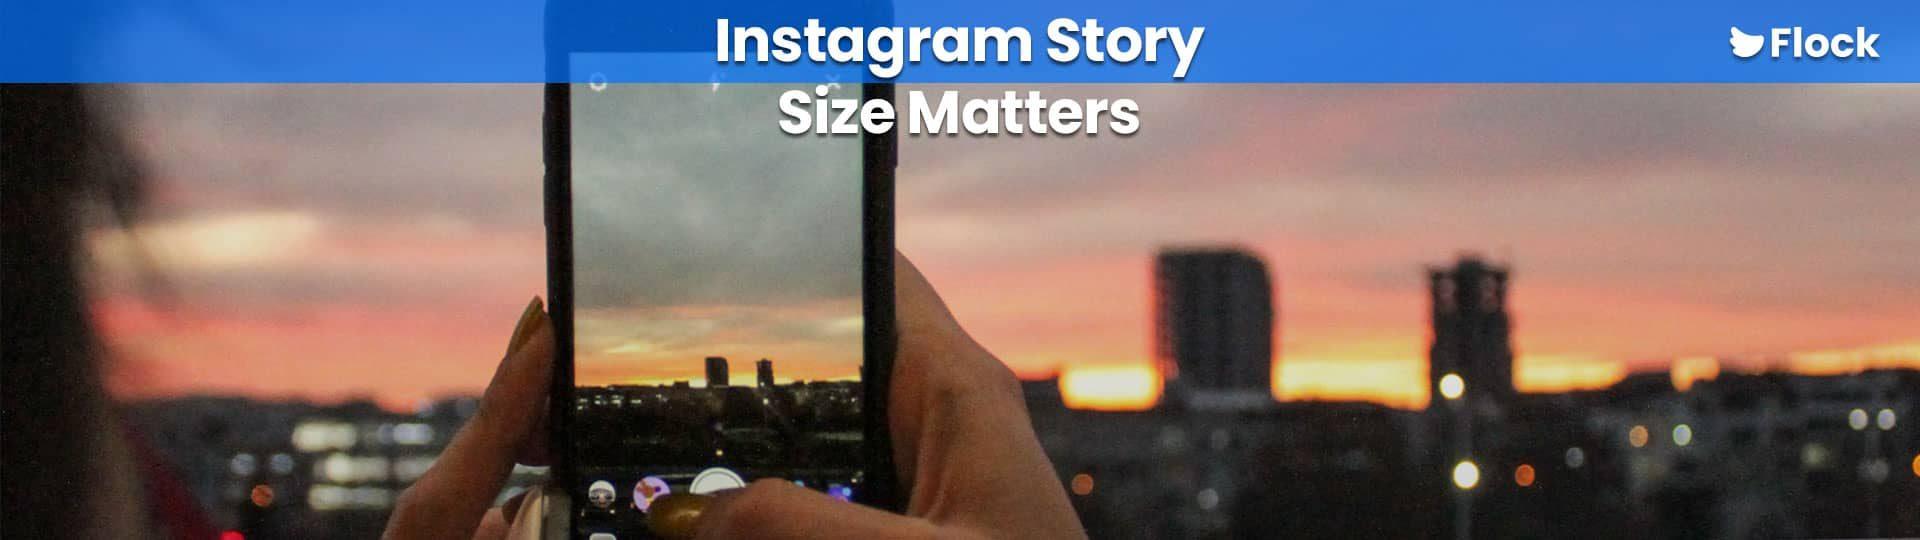 Instagram-Size-Matters